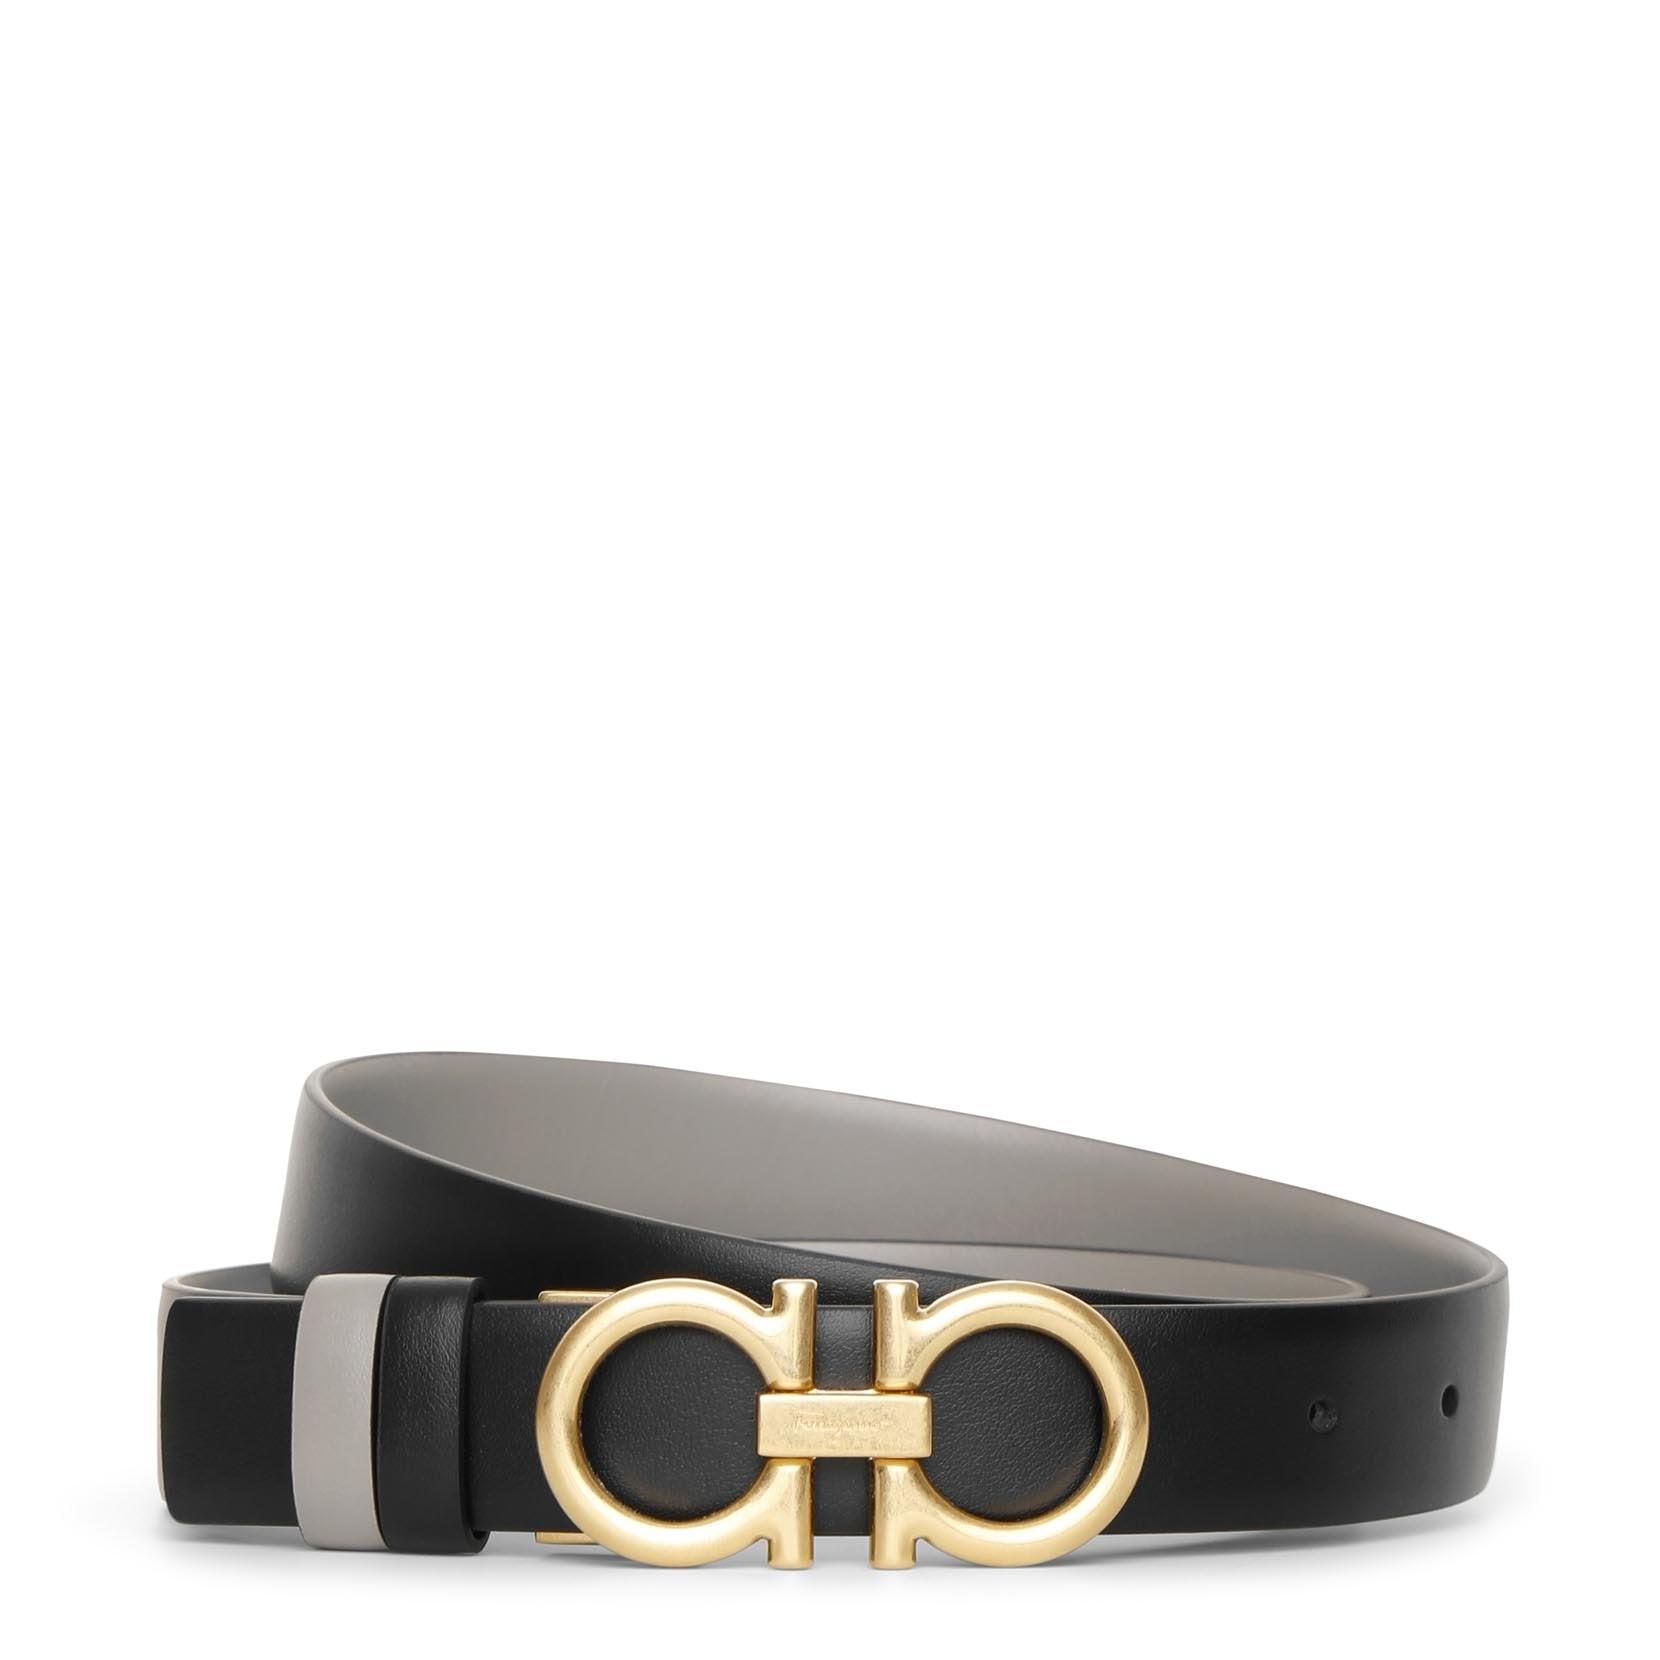 Salvatore Ferragamo Reversable and adjustable grey black leather belt  - black/grey - female - Size: 80